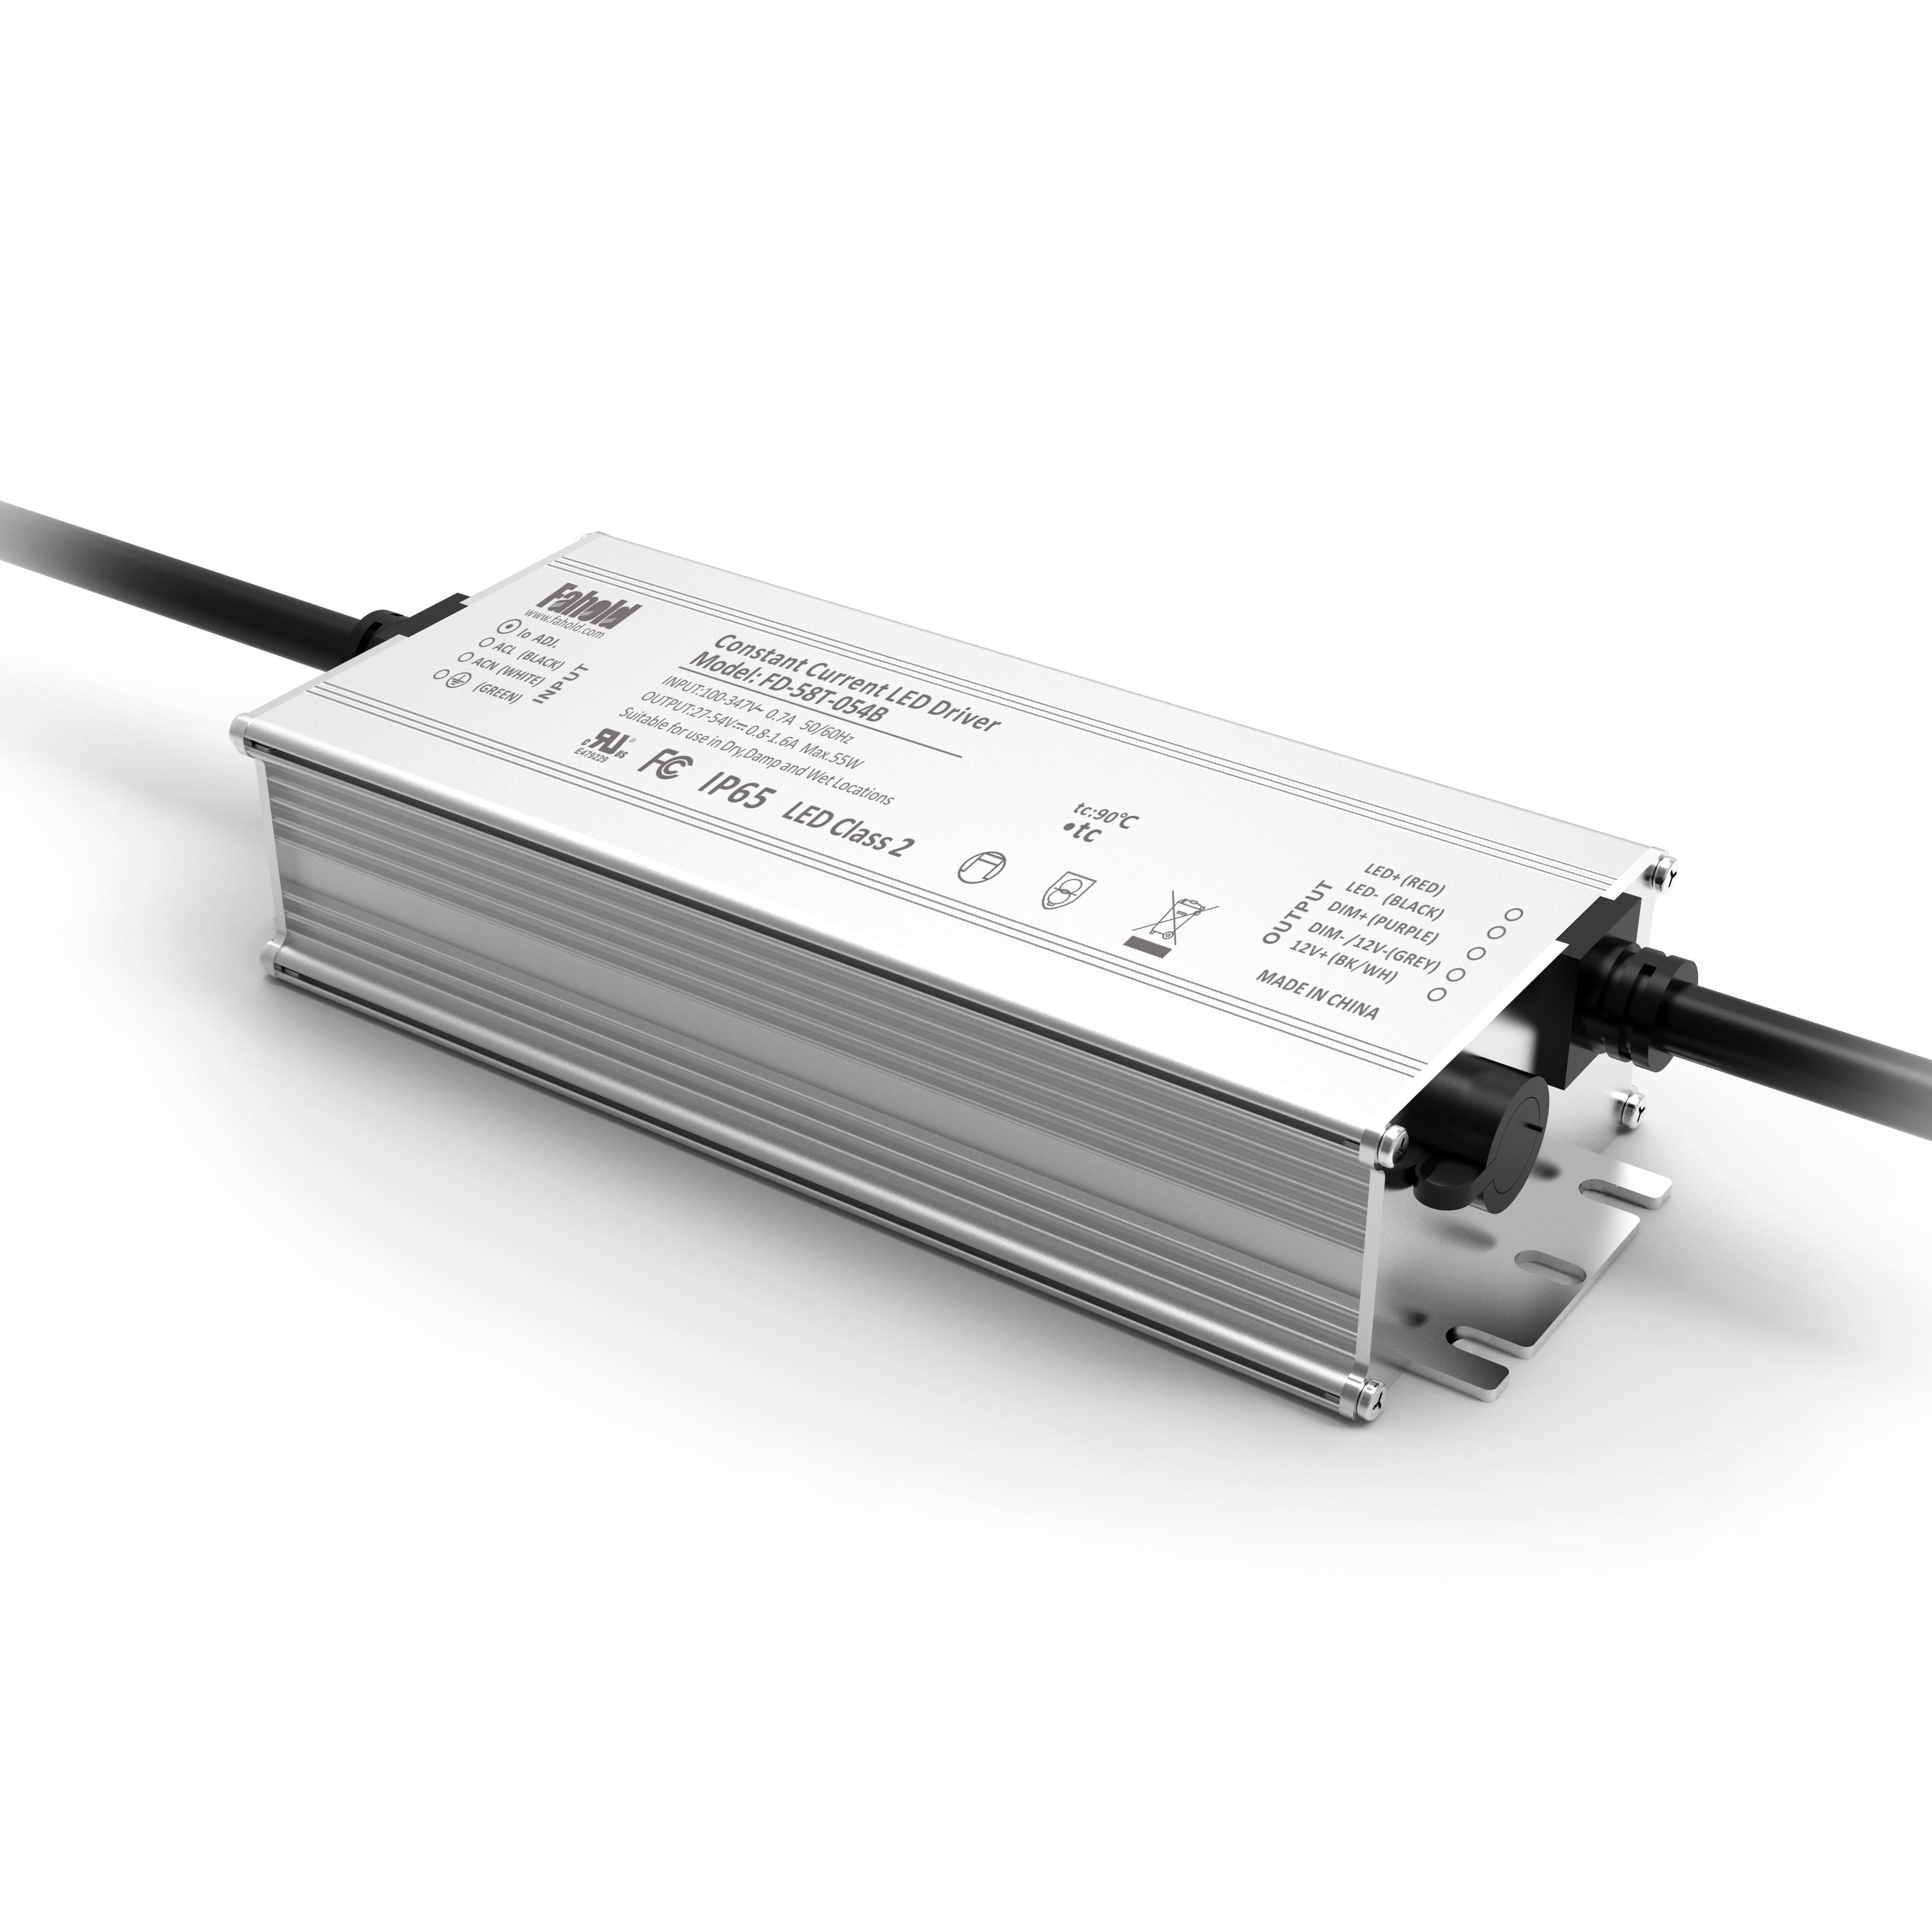 60w led driver12v 5a alimentation transformer 220v switch 12volt power.supply HH